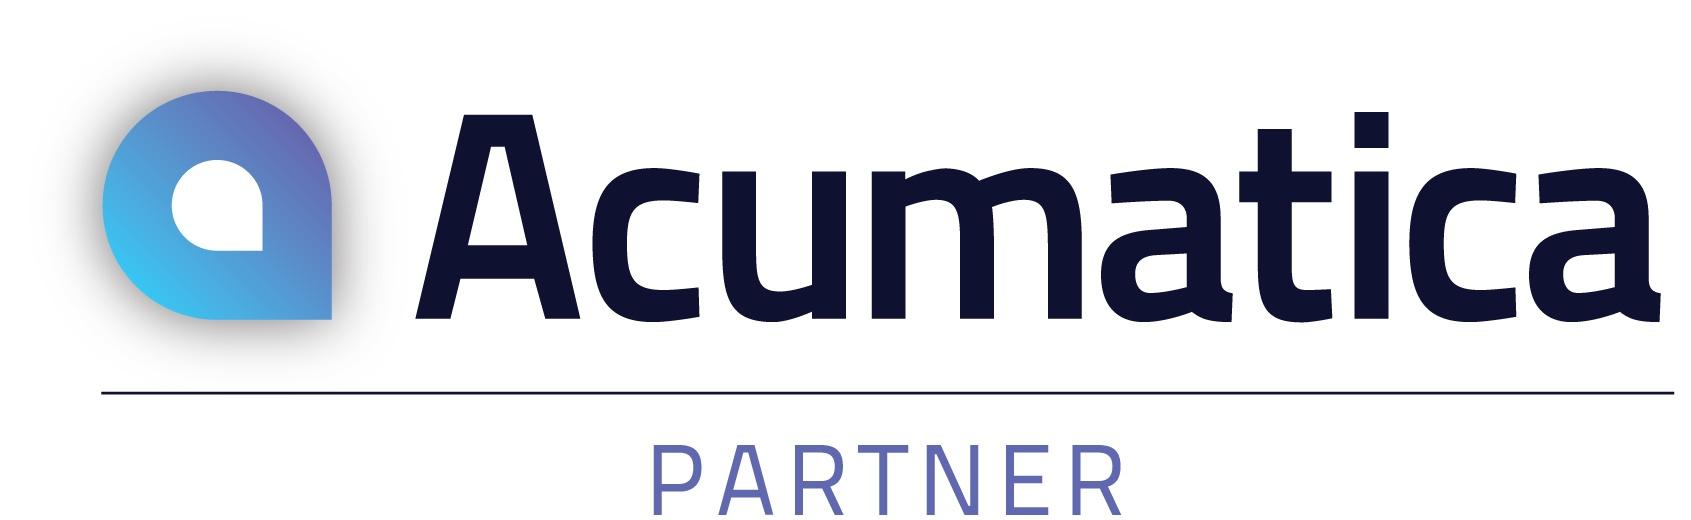 Acumatica_Partner_logo_JPG.jpg